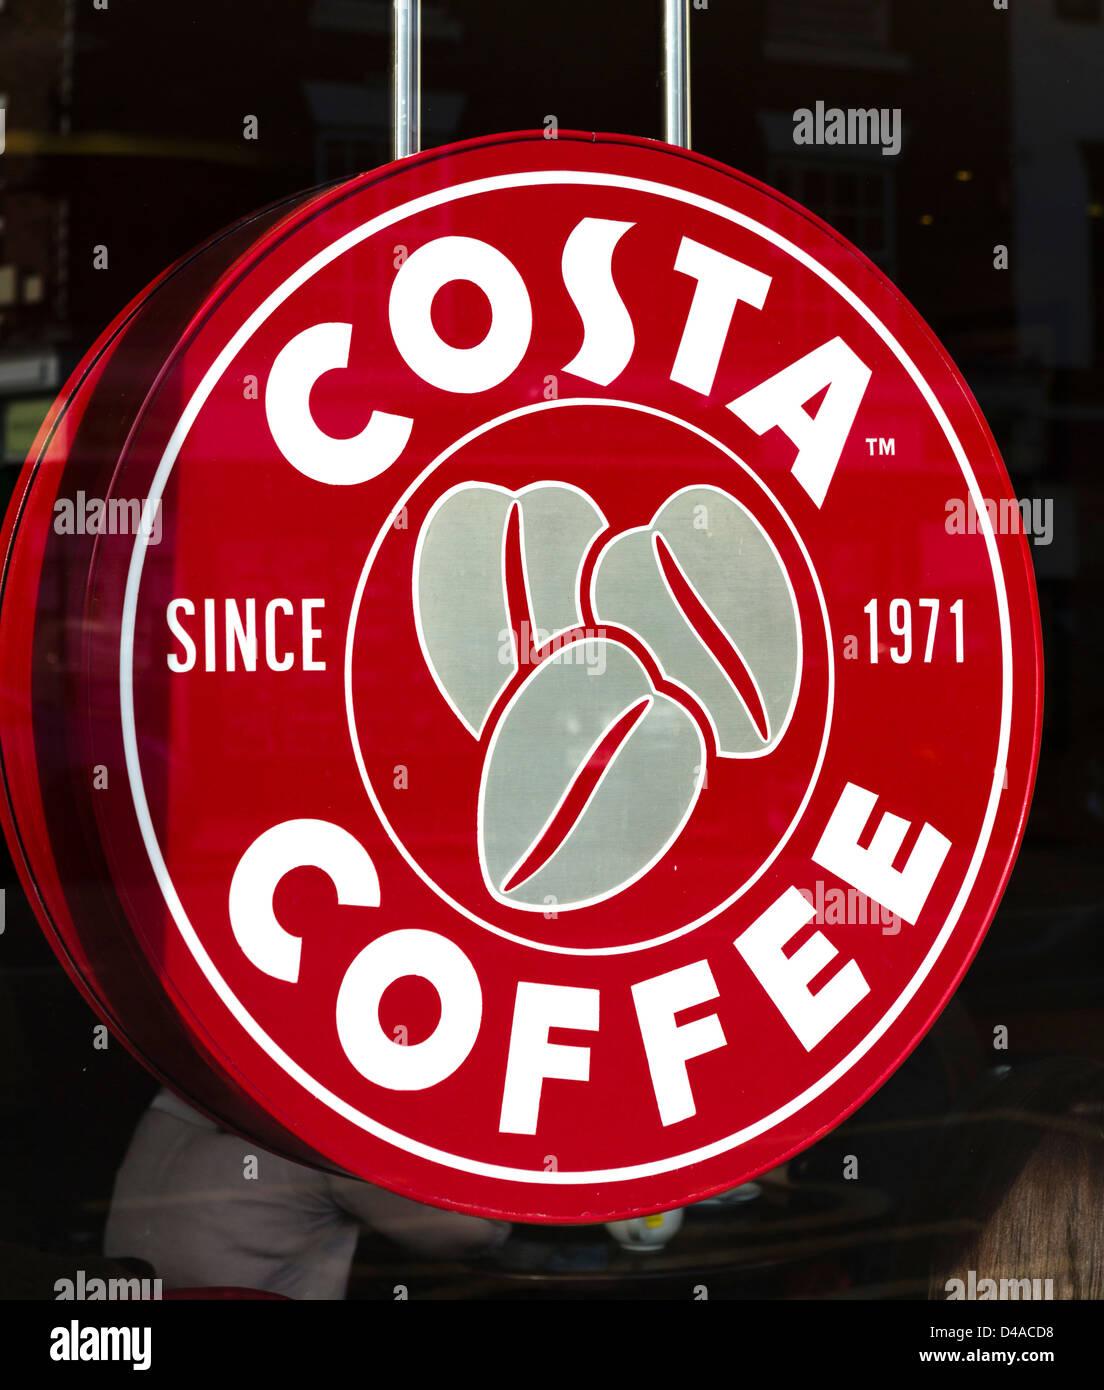 Café Costa, UK Photo Stock